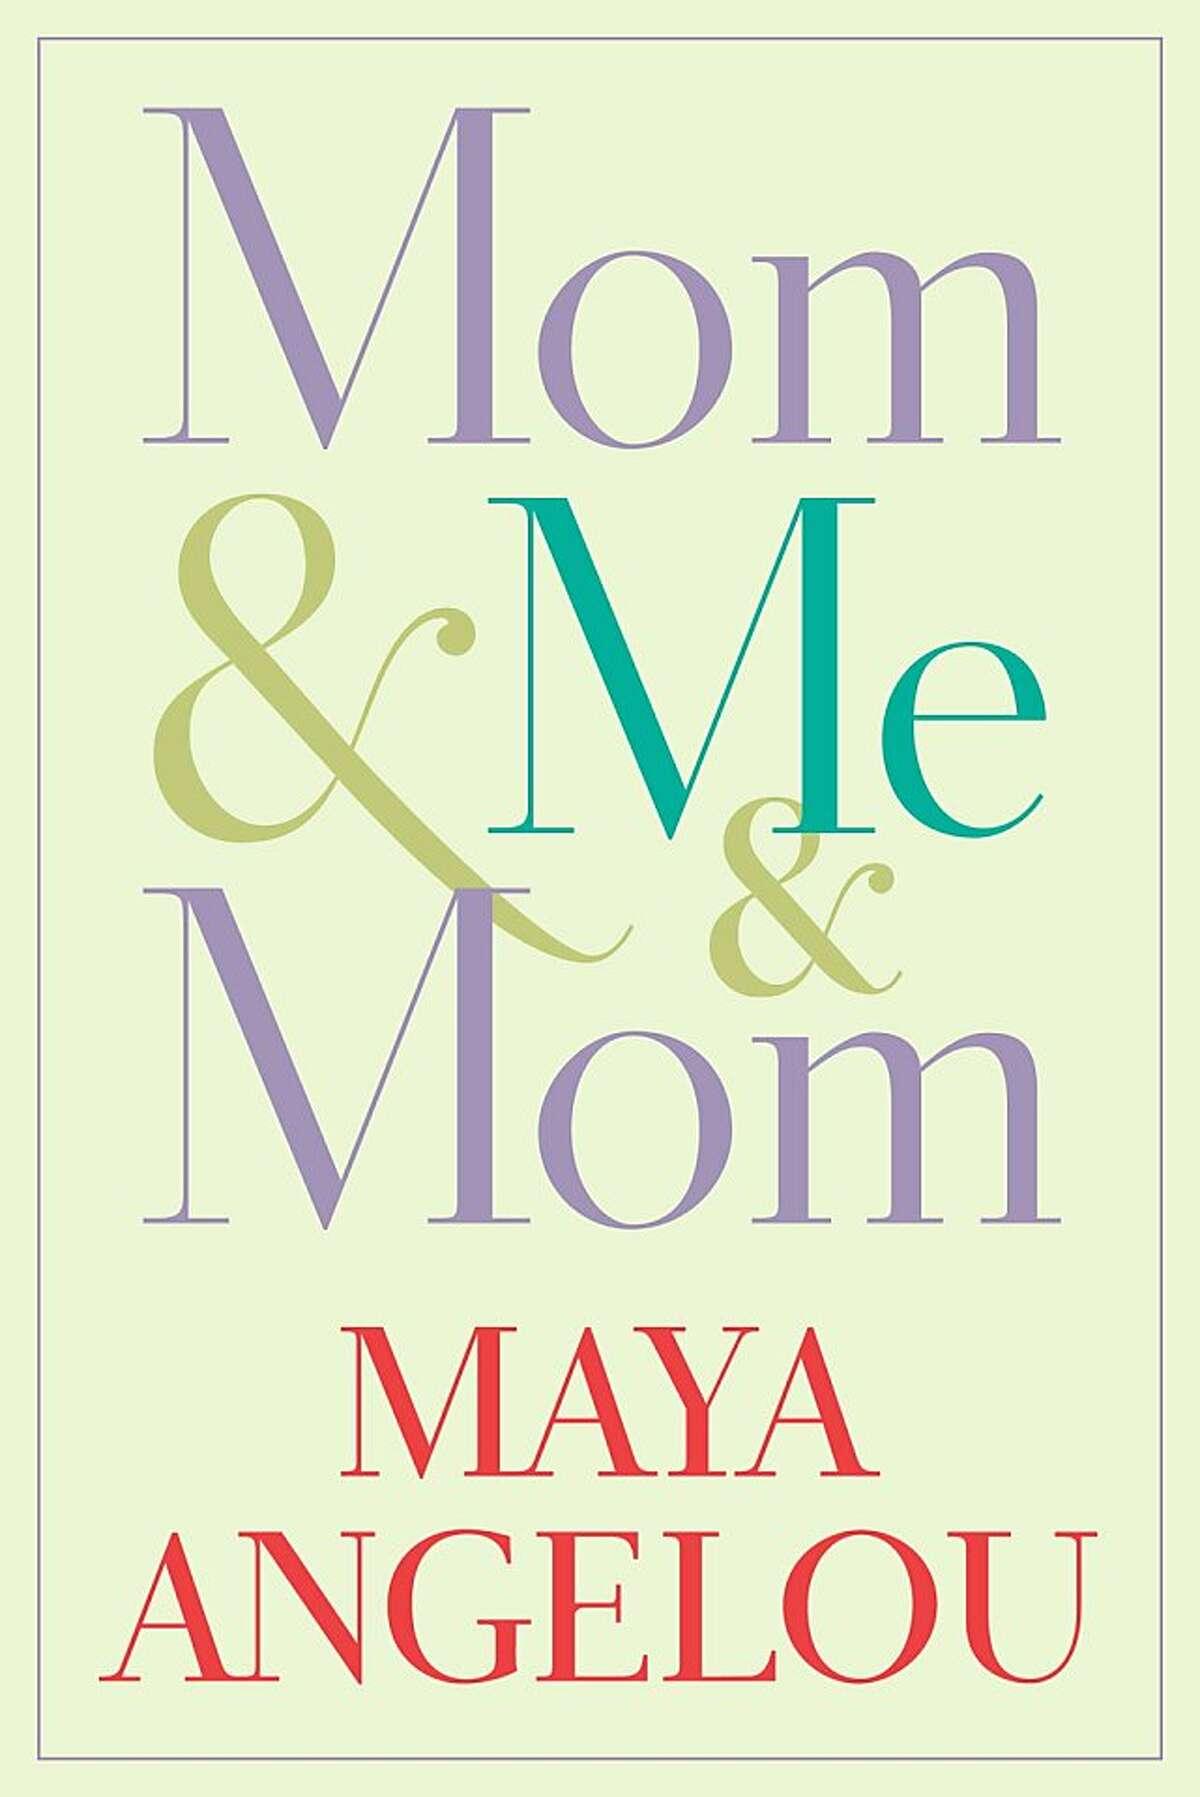 Mom & Me & Mom, by Maya Angelou